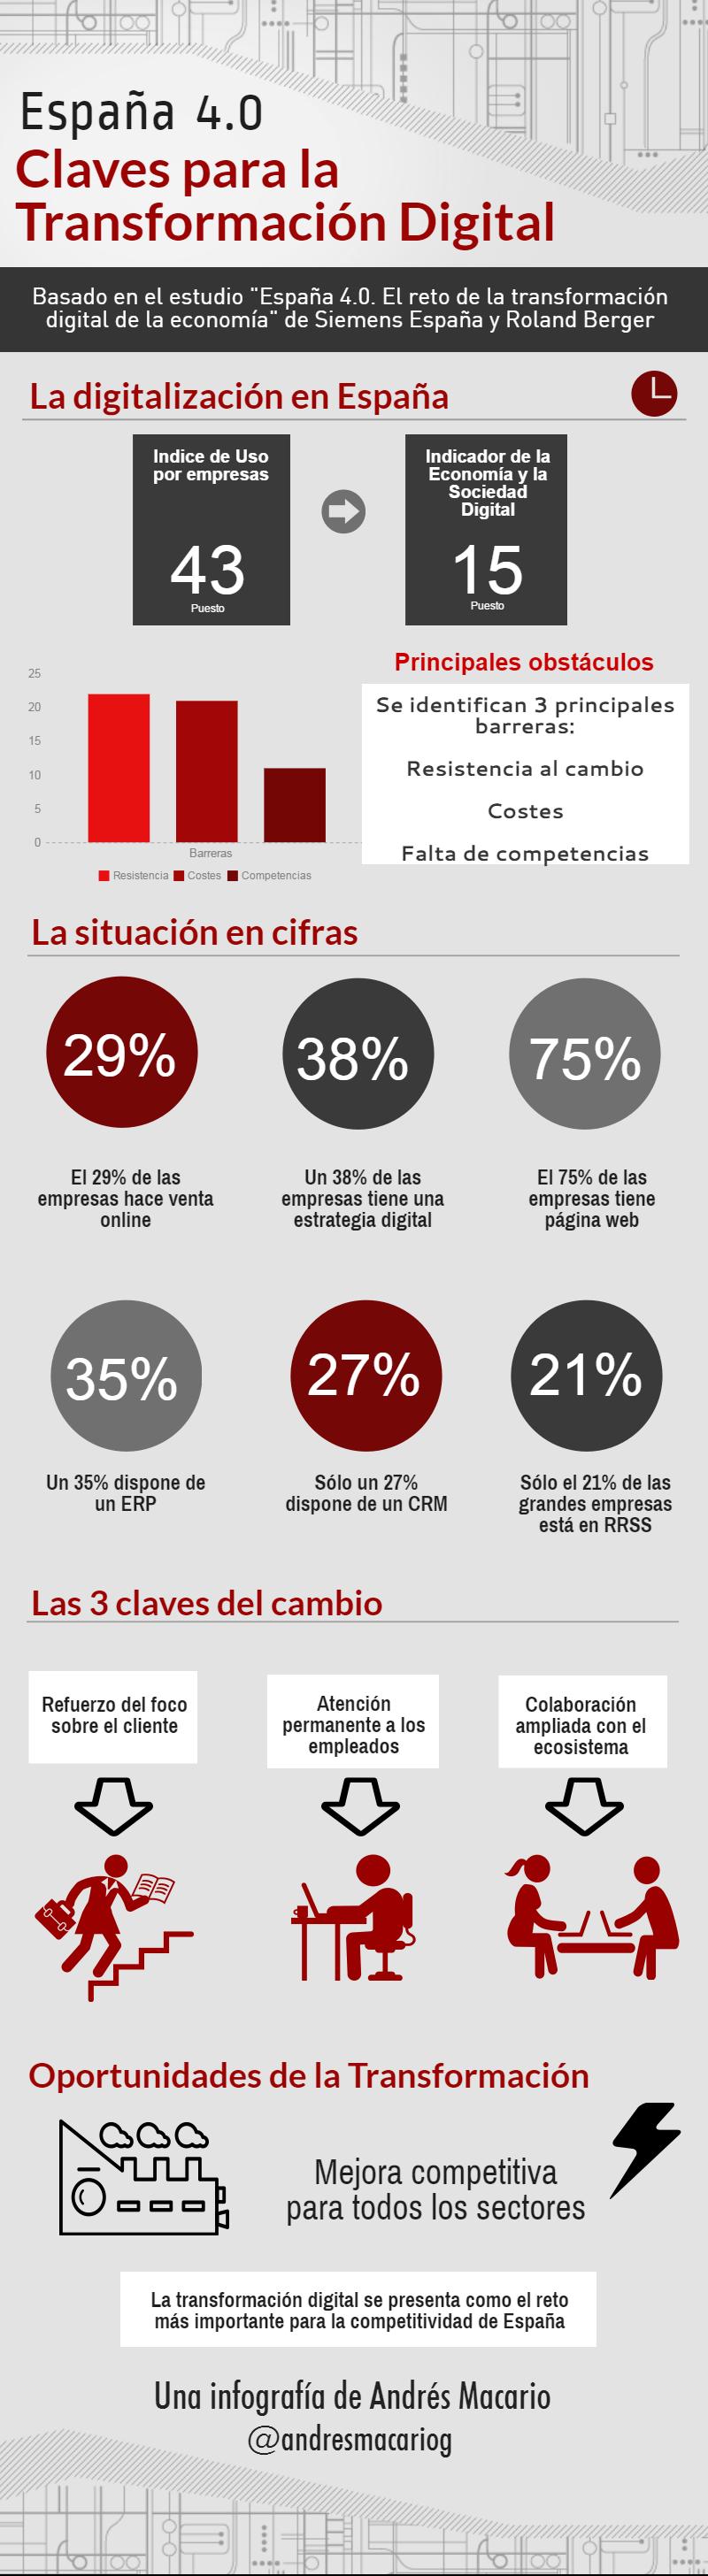 España 4.0: Claves para la Transformación Digital #infografia #infographic